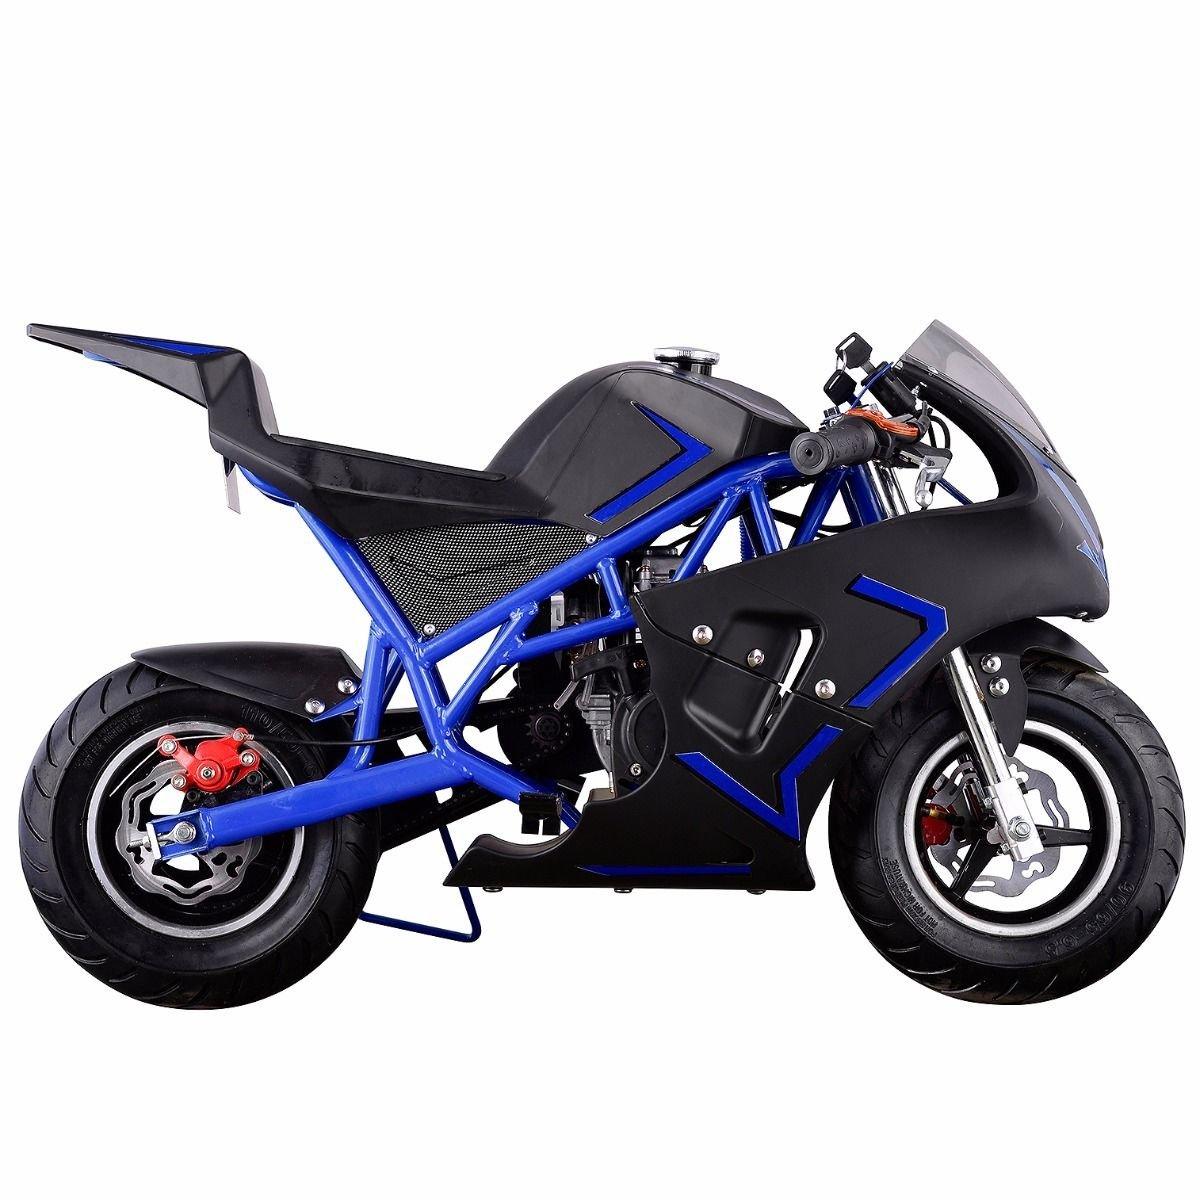 new gas pocket bike motorbike scooter epa engine motorcycle kids teens mini  blue sports outdoors jpg razor